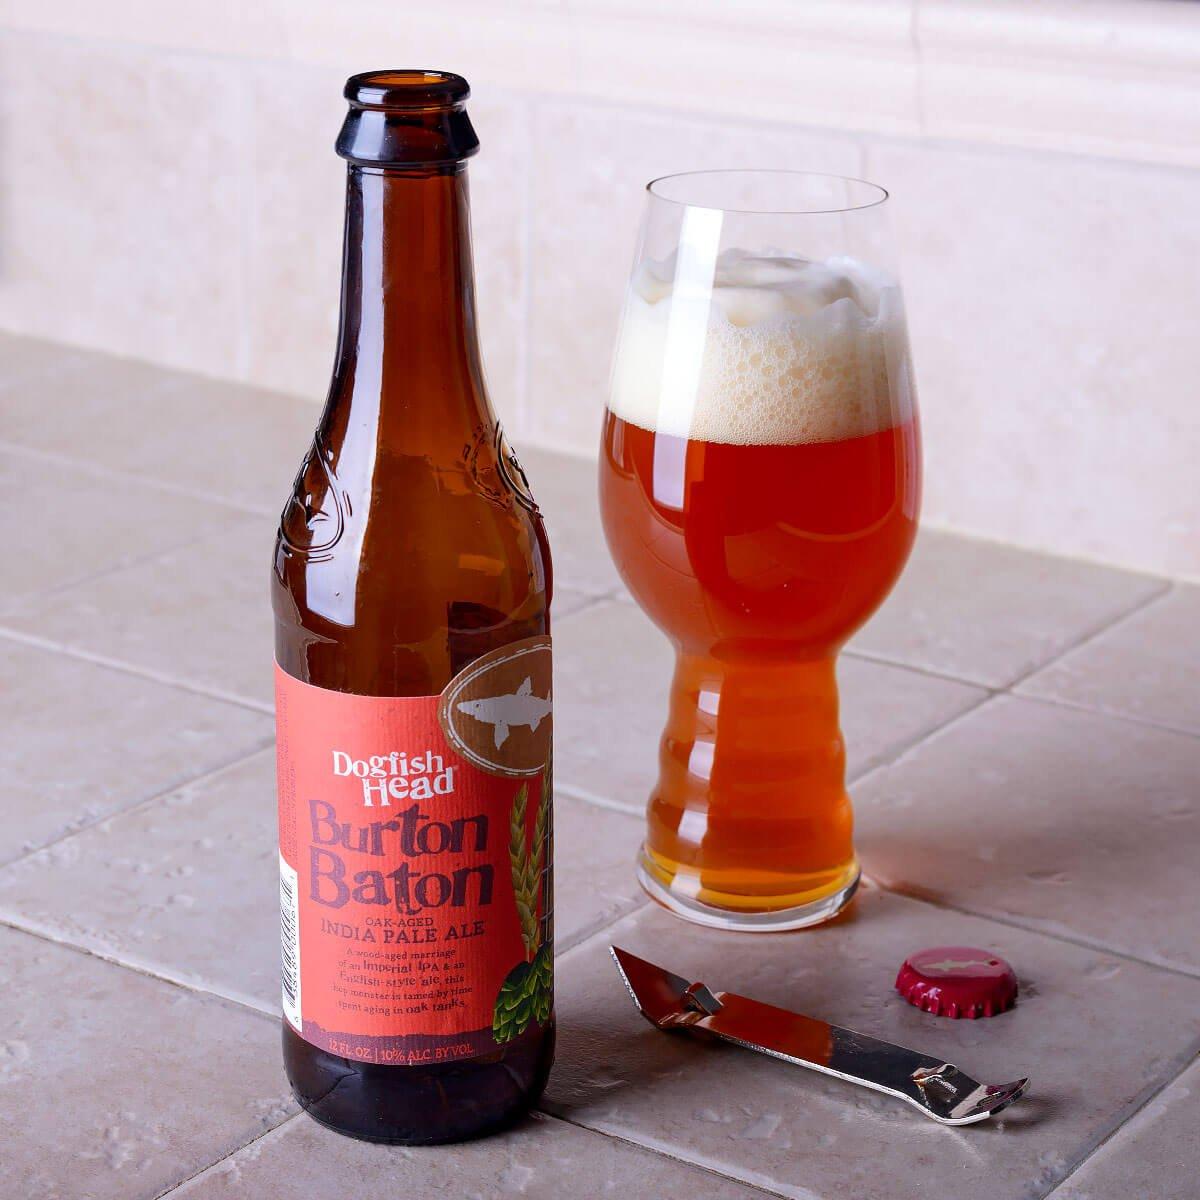 Burton Baton, an American Double IPA by Dogfish Head Craft Brewery